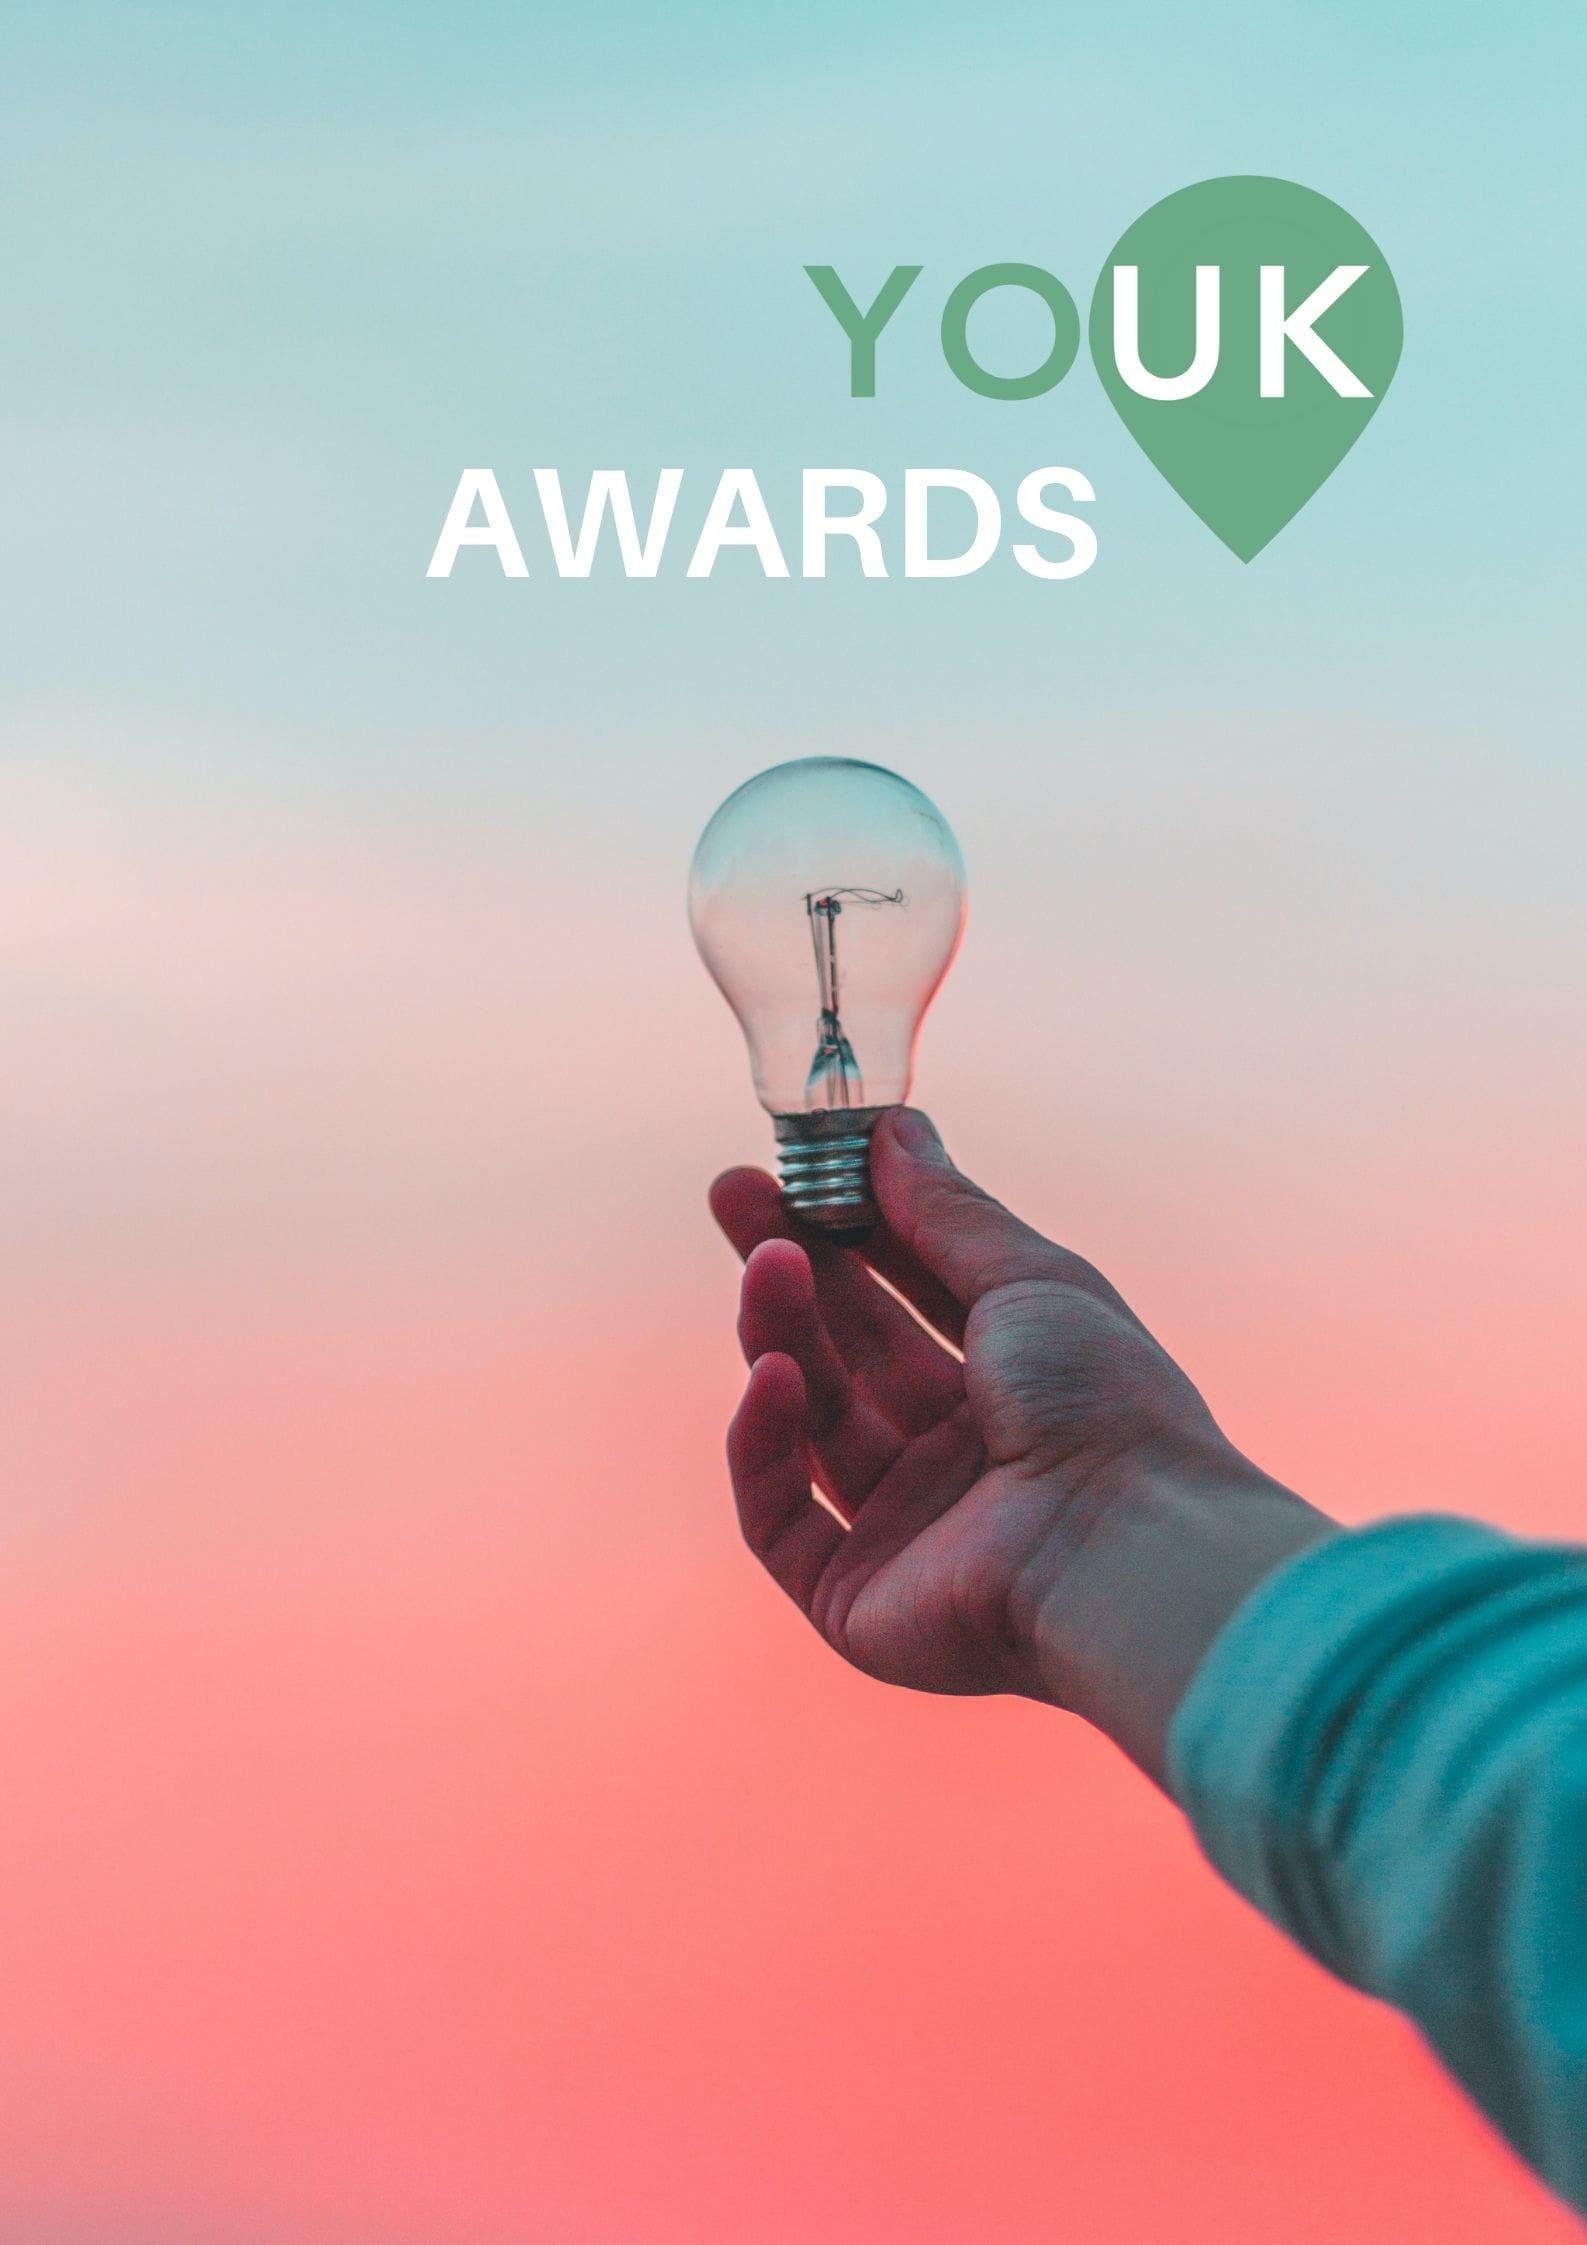 YouK Award winning brands